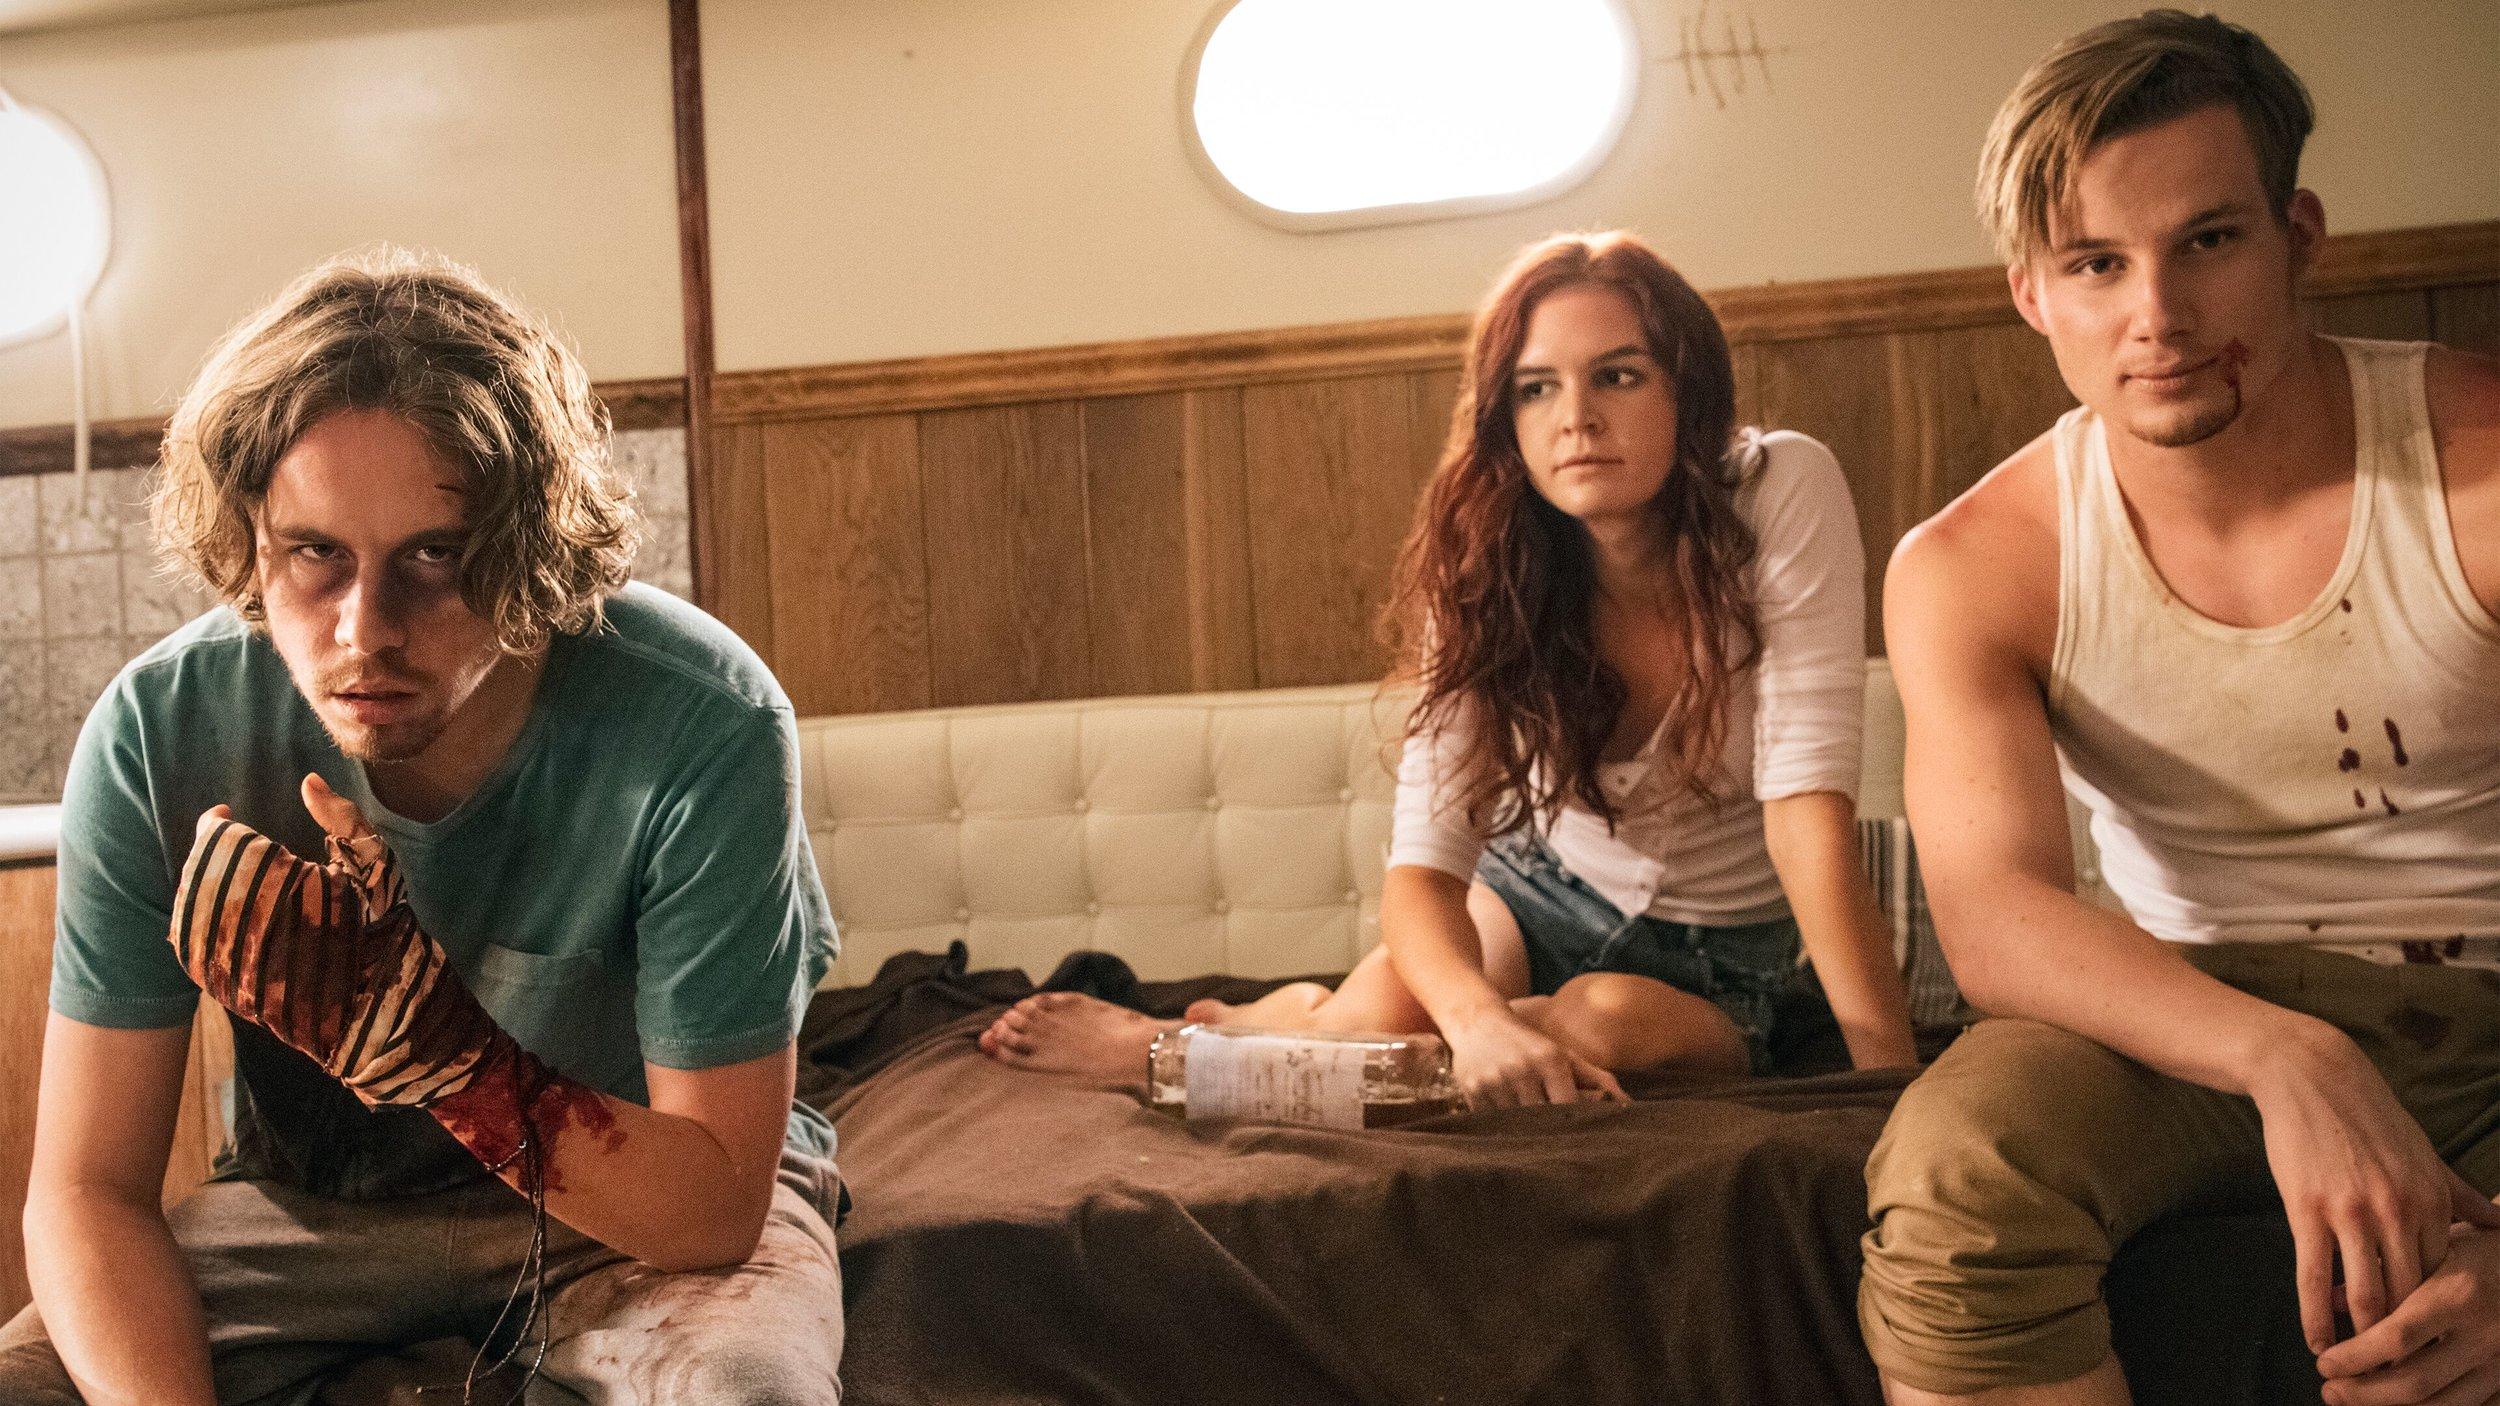 Harpoon-2019-movie-chattanooga-film-festival.jpeg